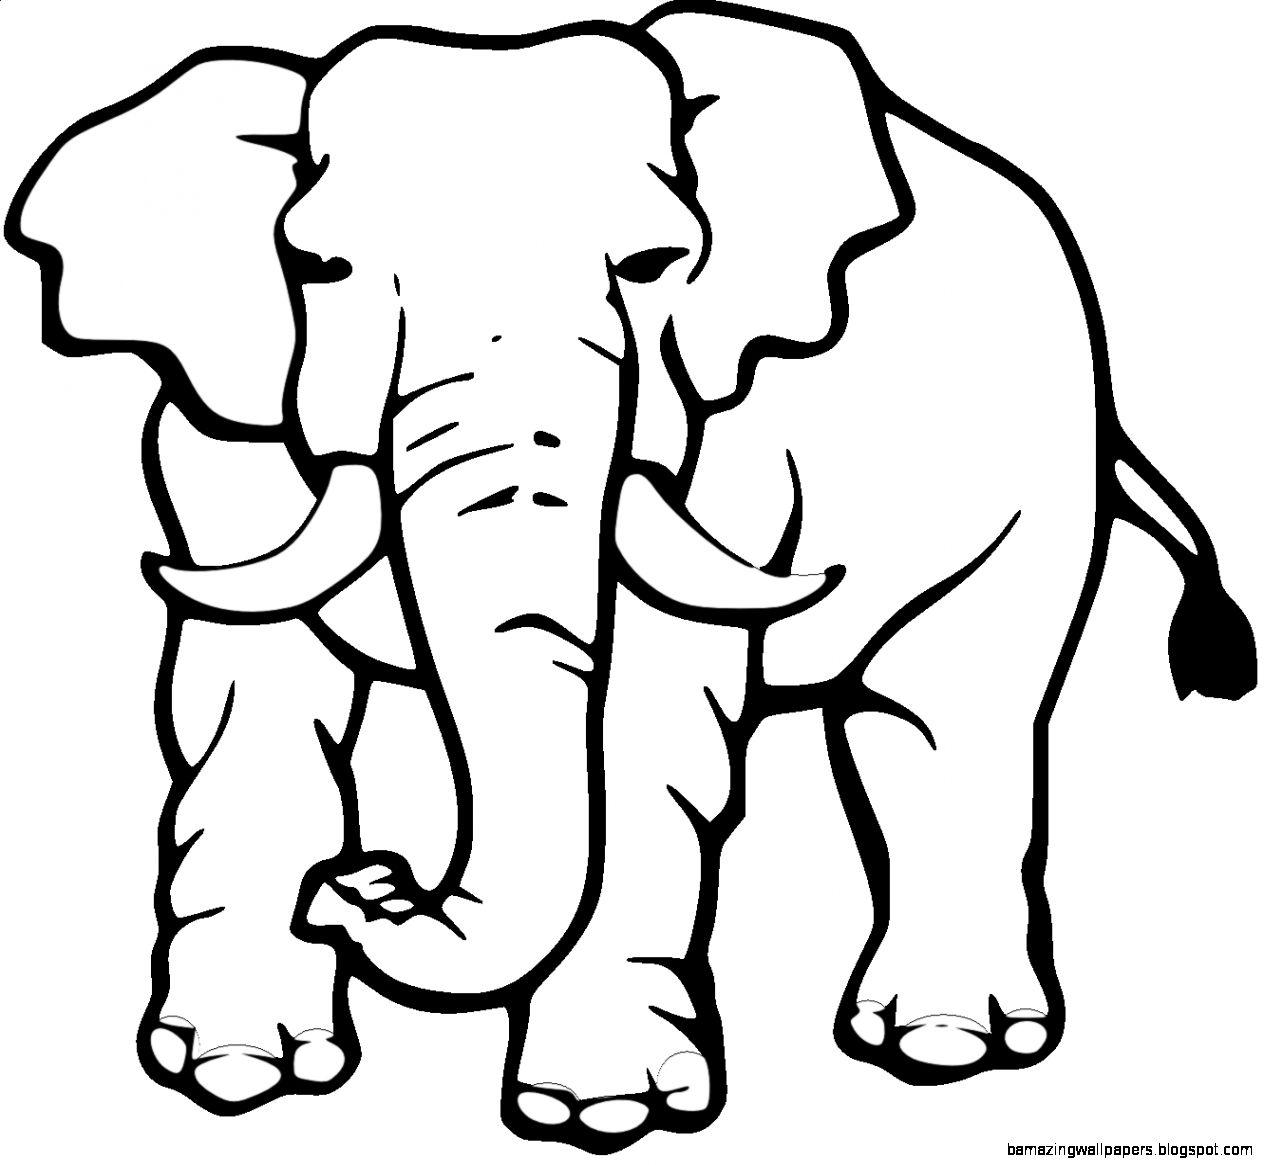 Elephant black and white clipart jpg transparent download Best Cute Elephant Clipart Black and White #28172 - Clipartion.com jpg transparent download